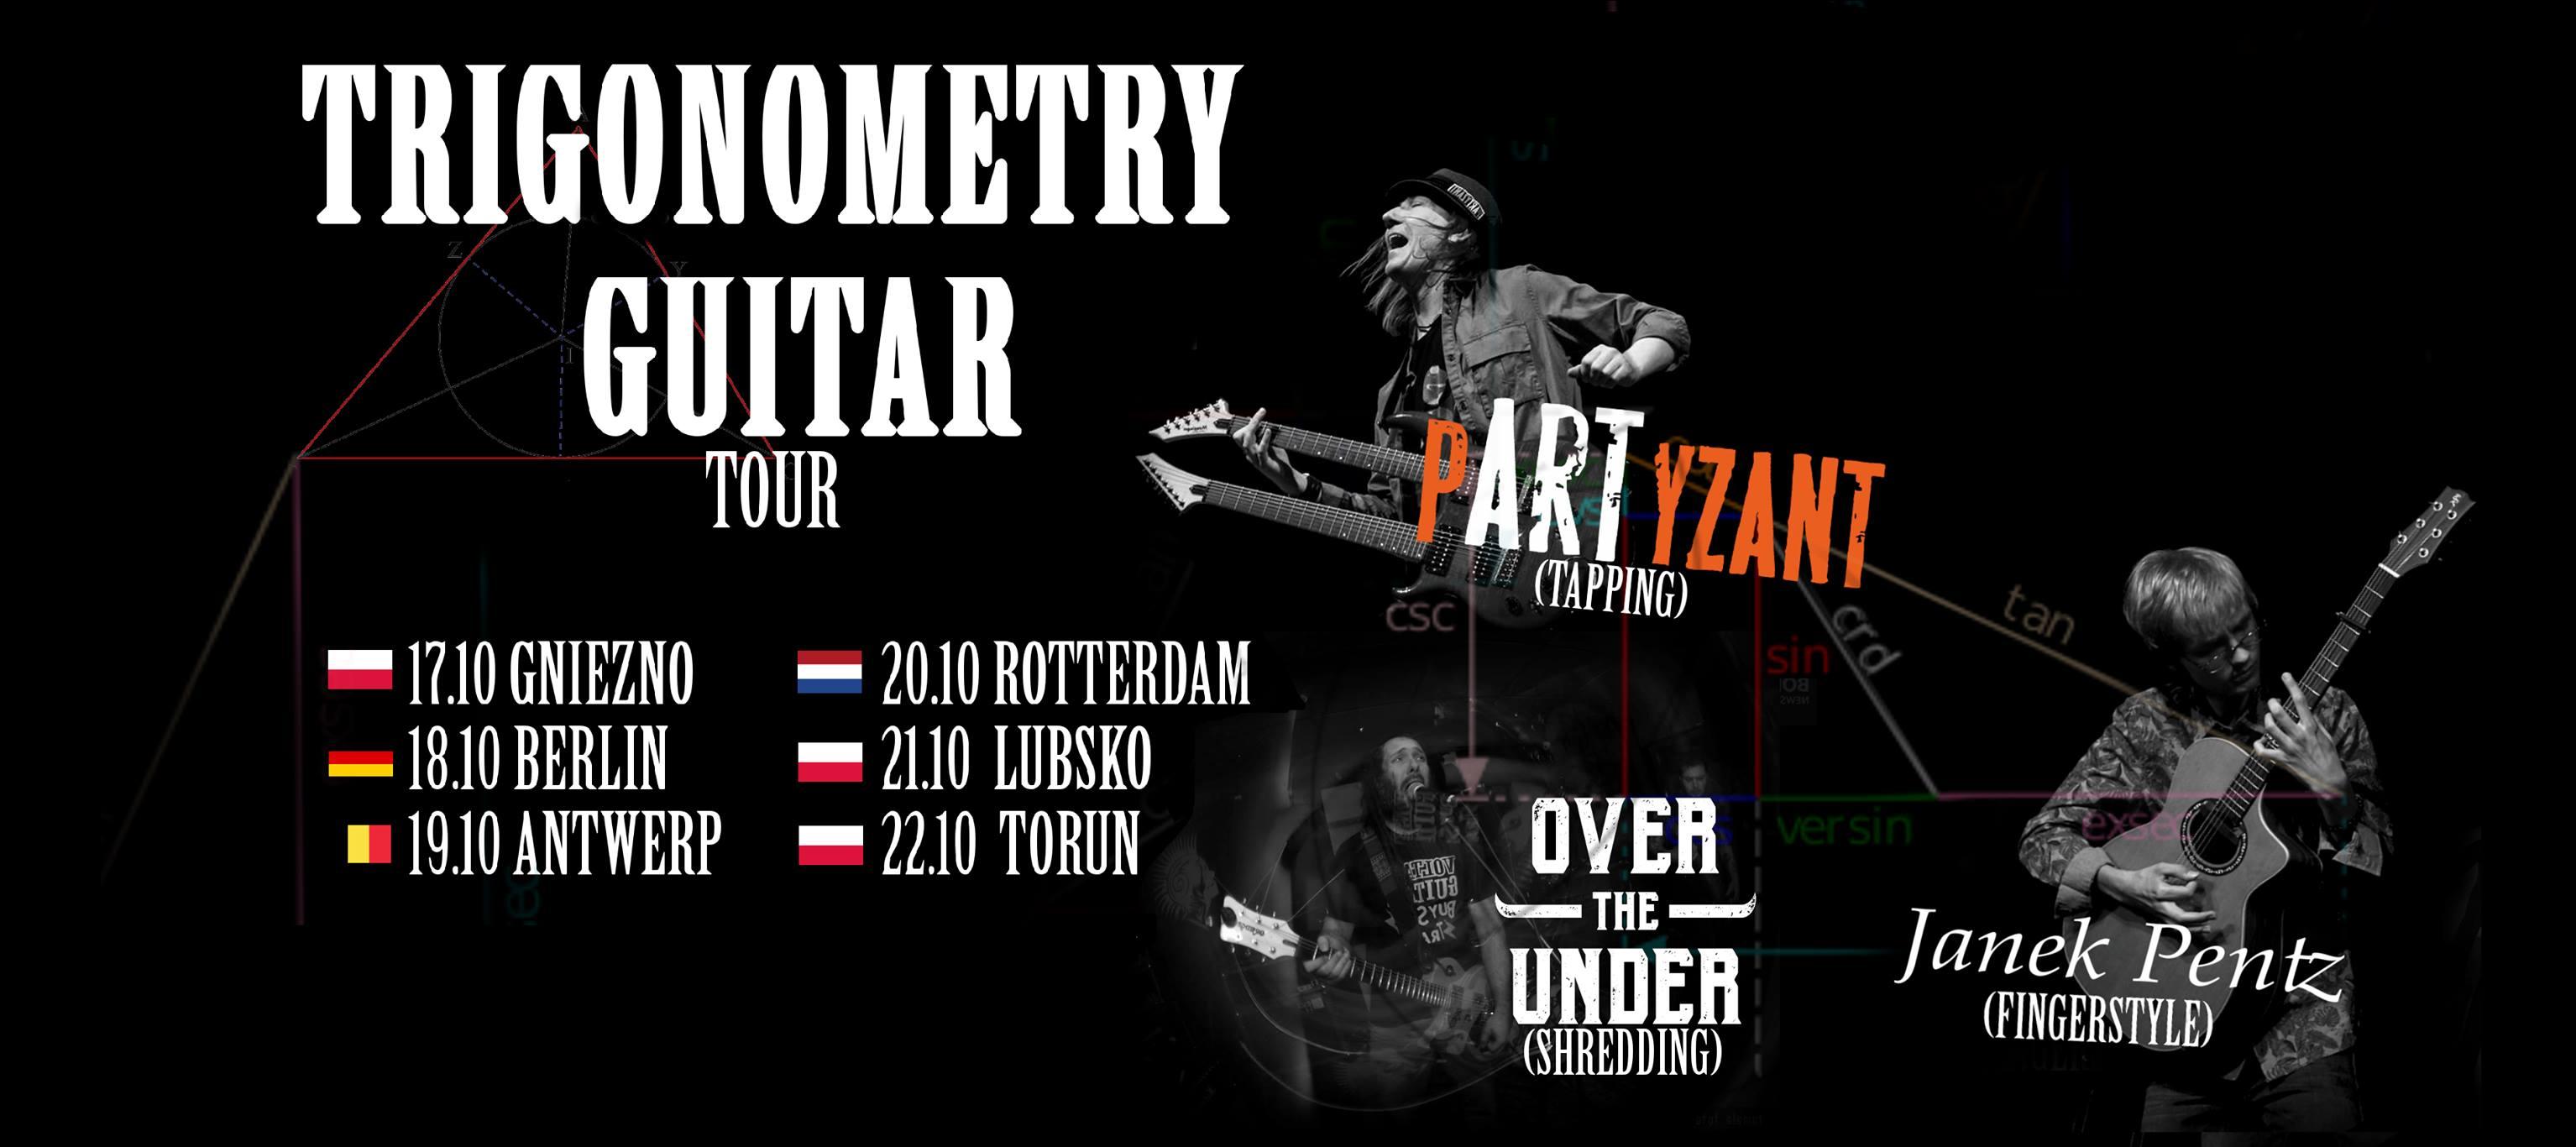 Bildergebnis für Trigonometry guitar tour